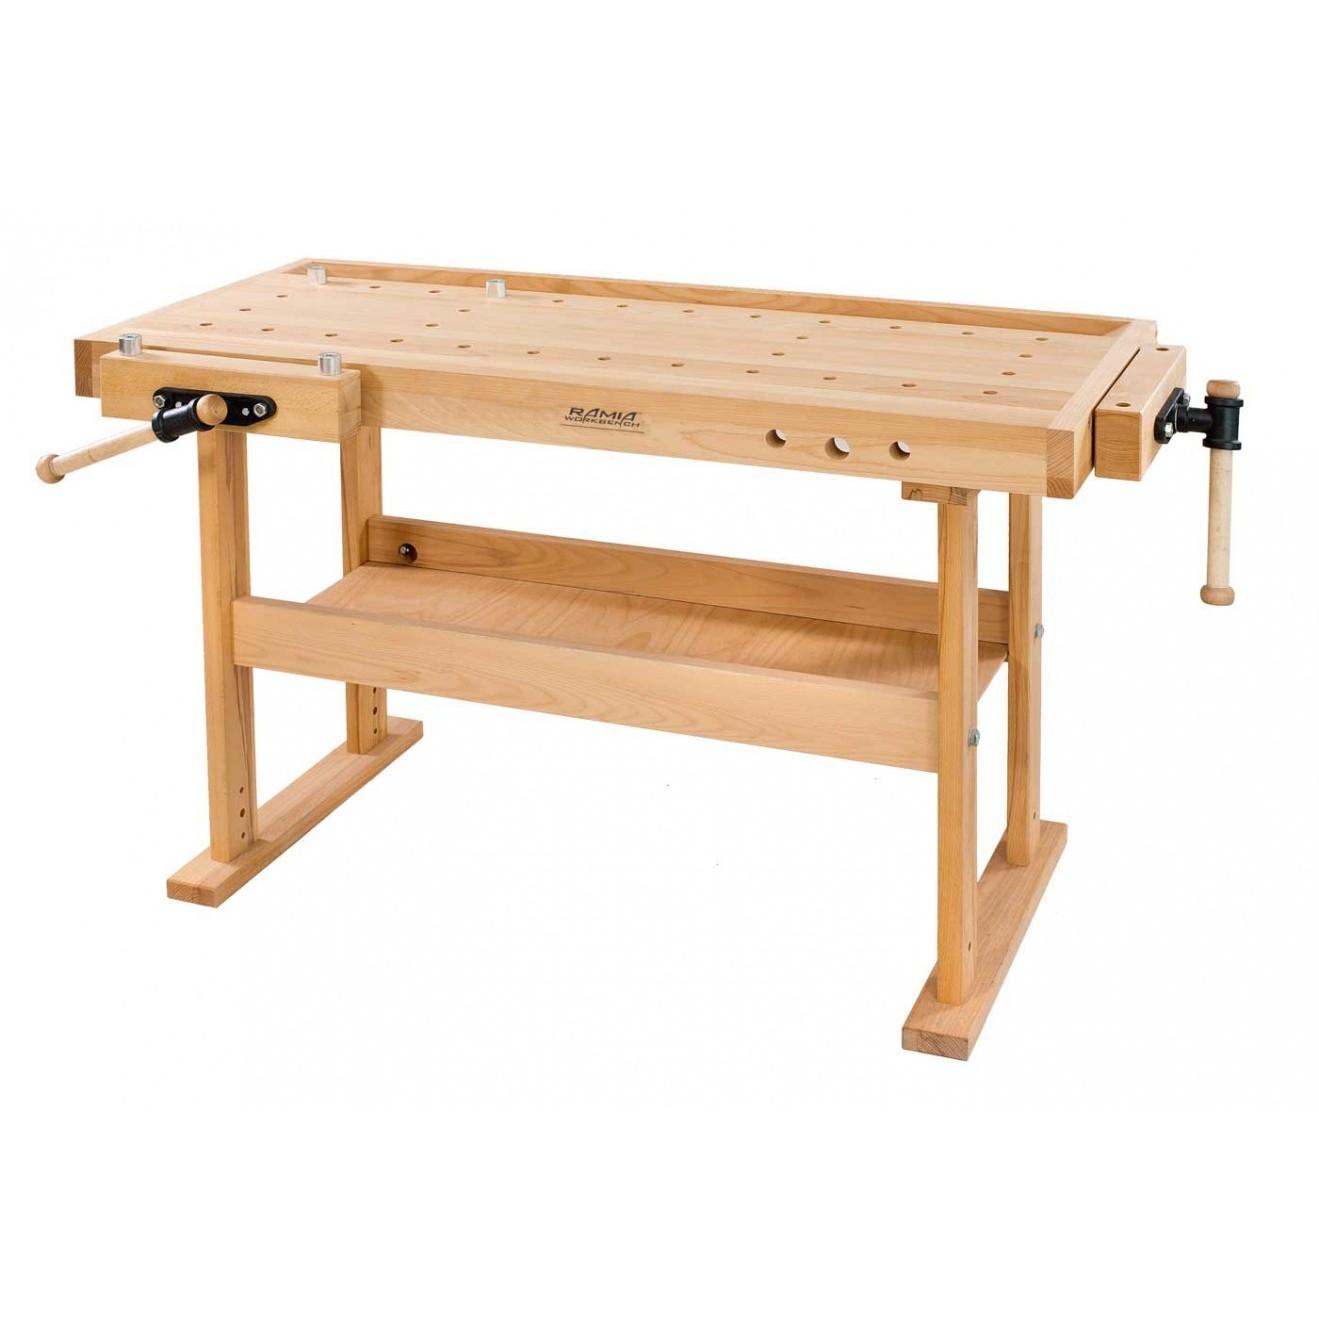 Excellent Ramia Workbench Diamond 1500 Andrewgaddart Wooden Chair Designs For Living Room Andrewgaddartcom